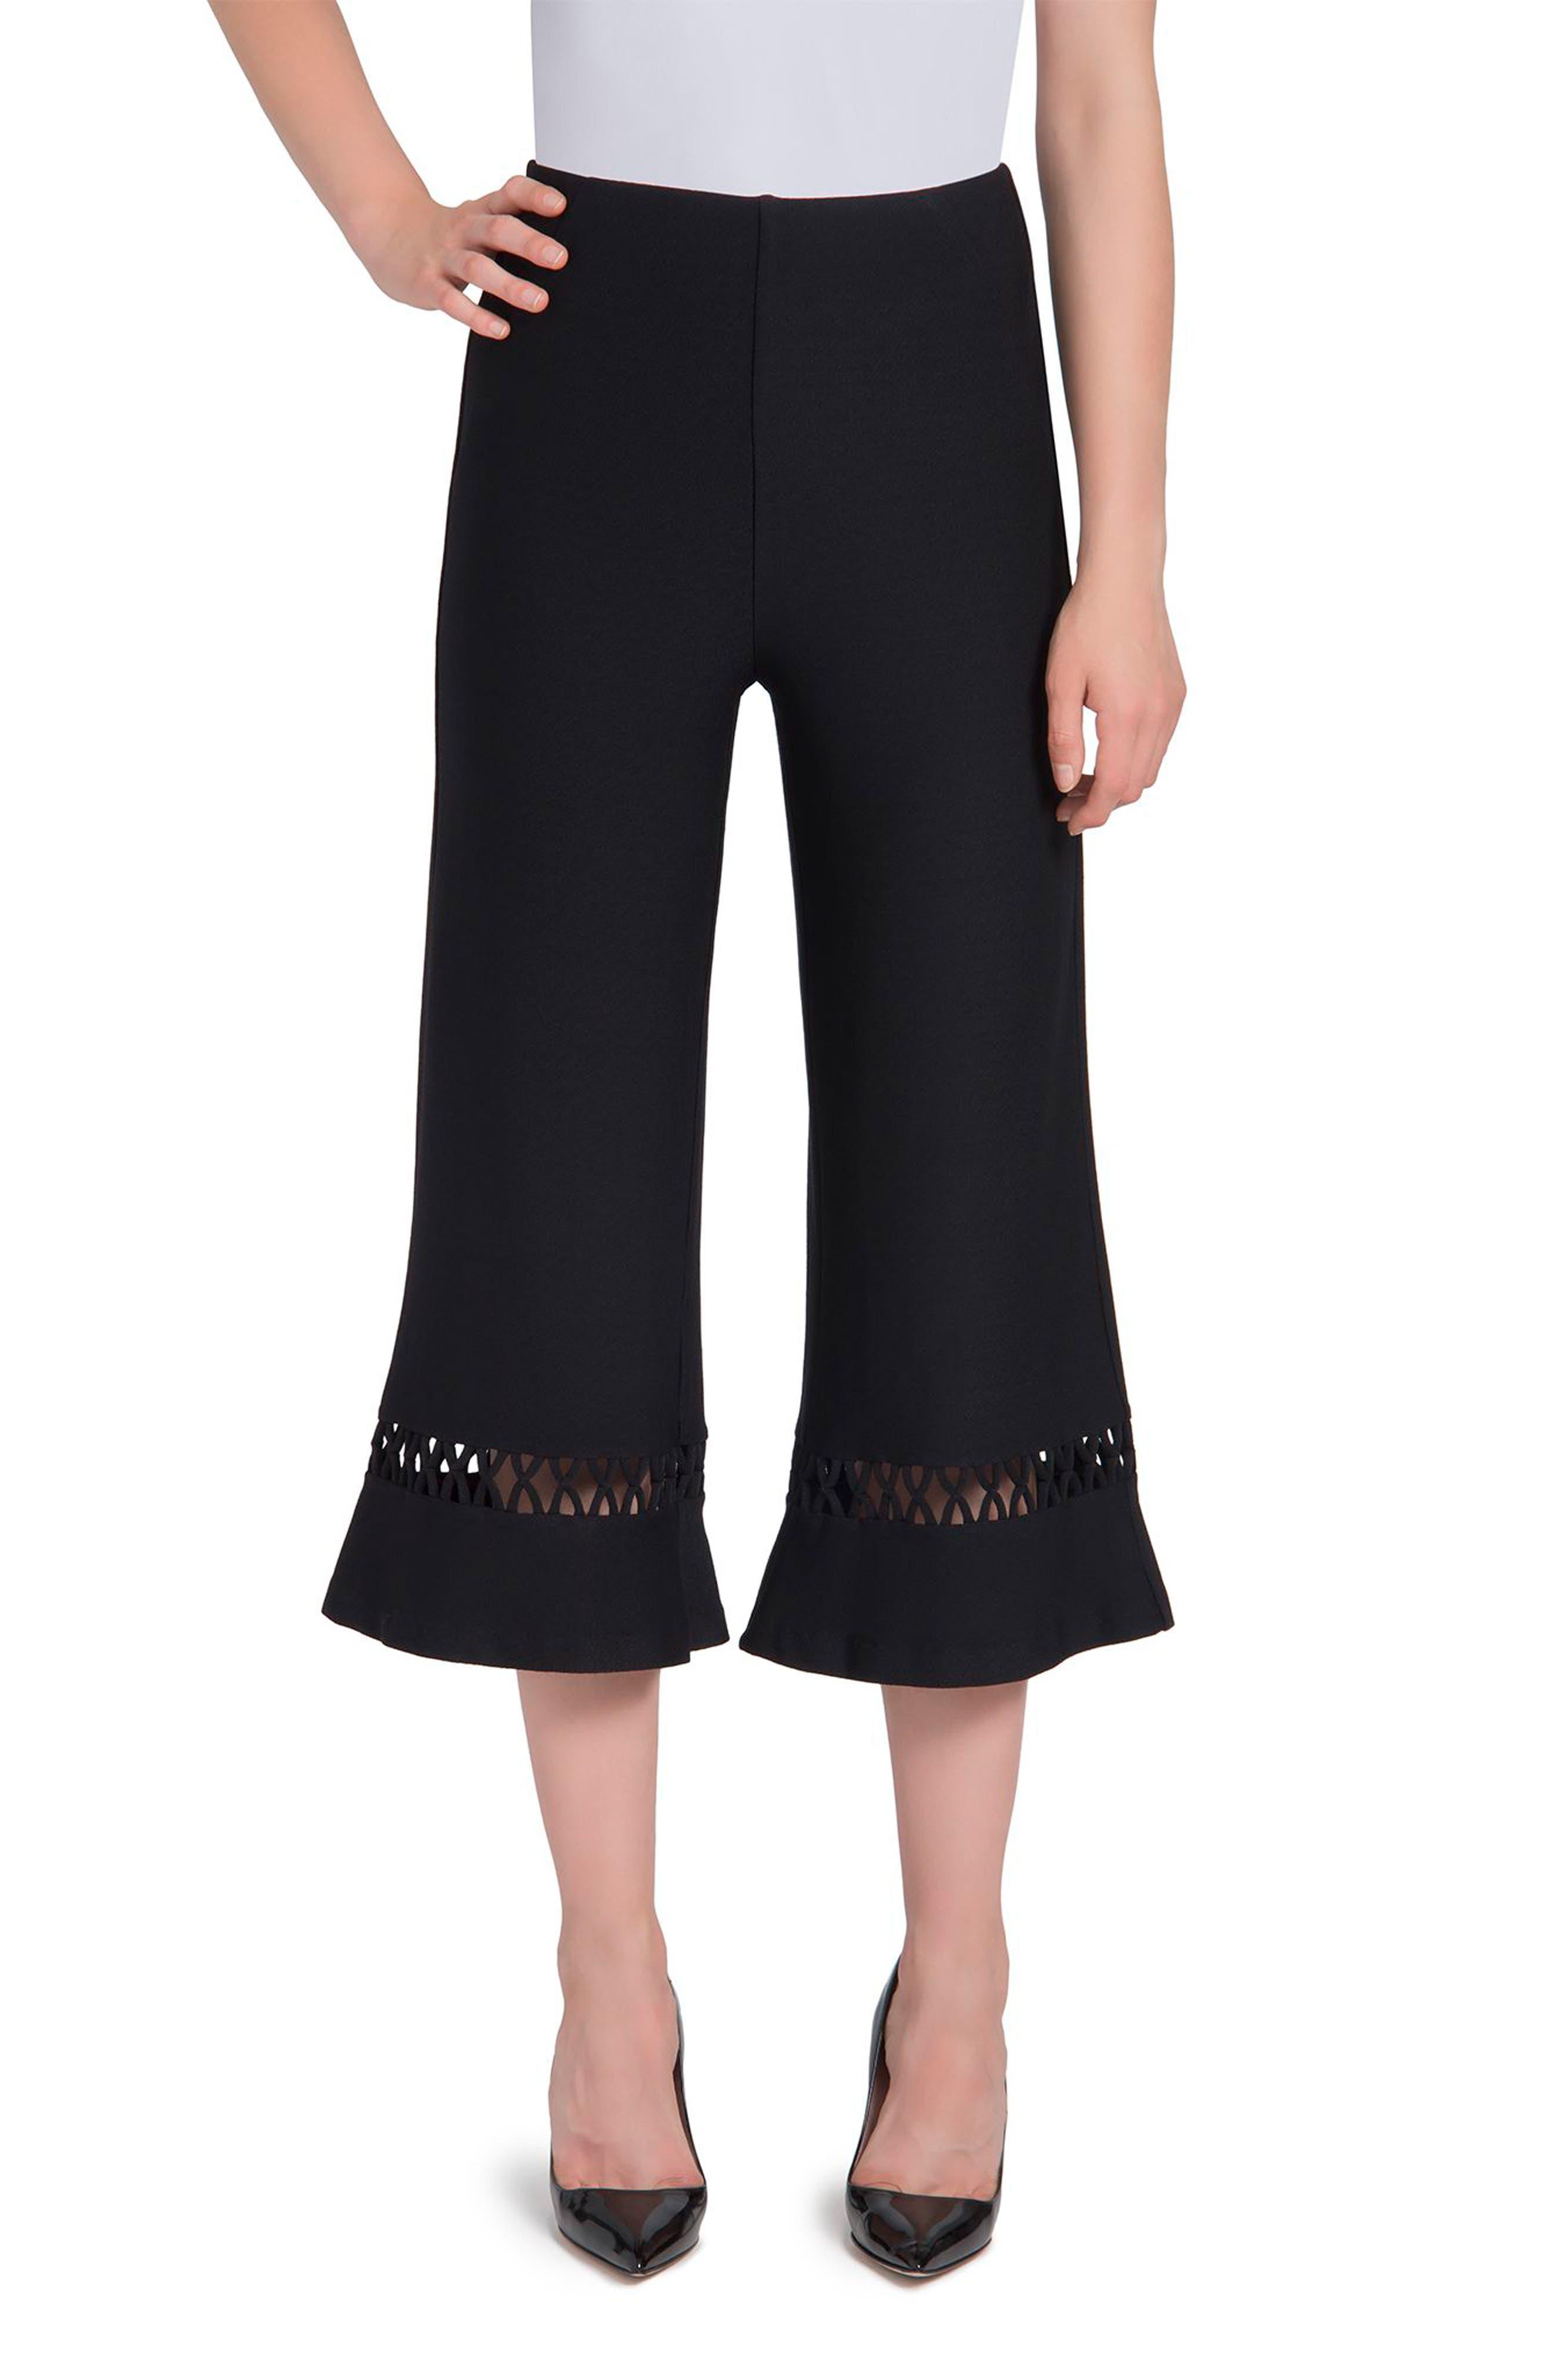 Cecily High Waist Crop Palazzo Pants,                         Main,                         color, Black